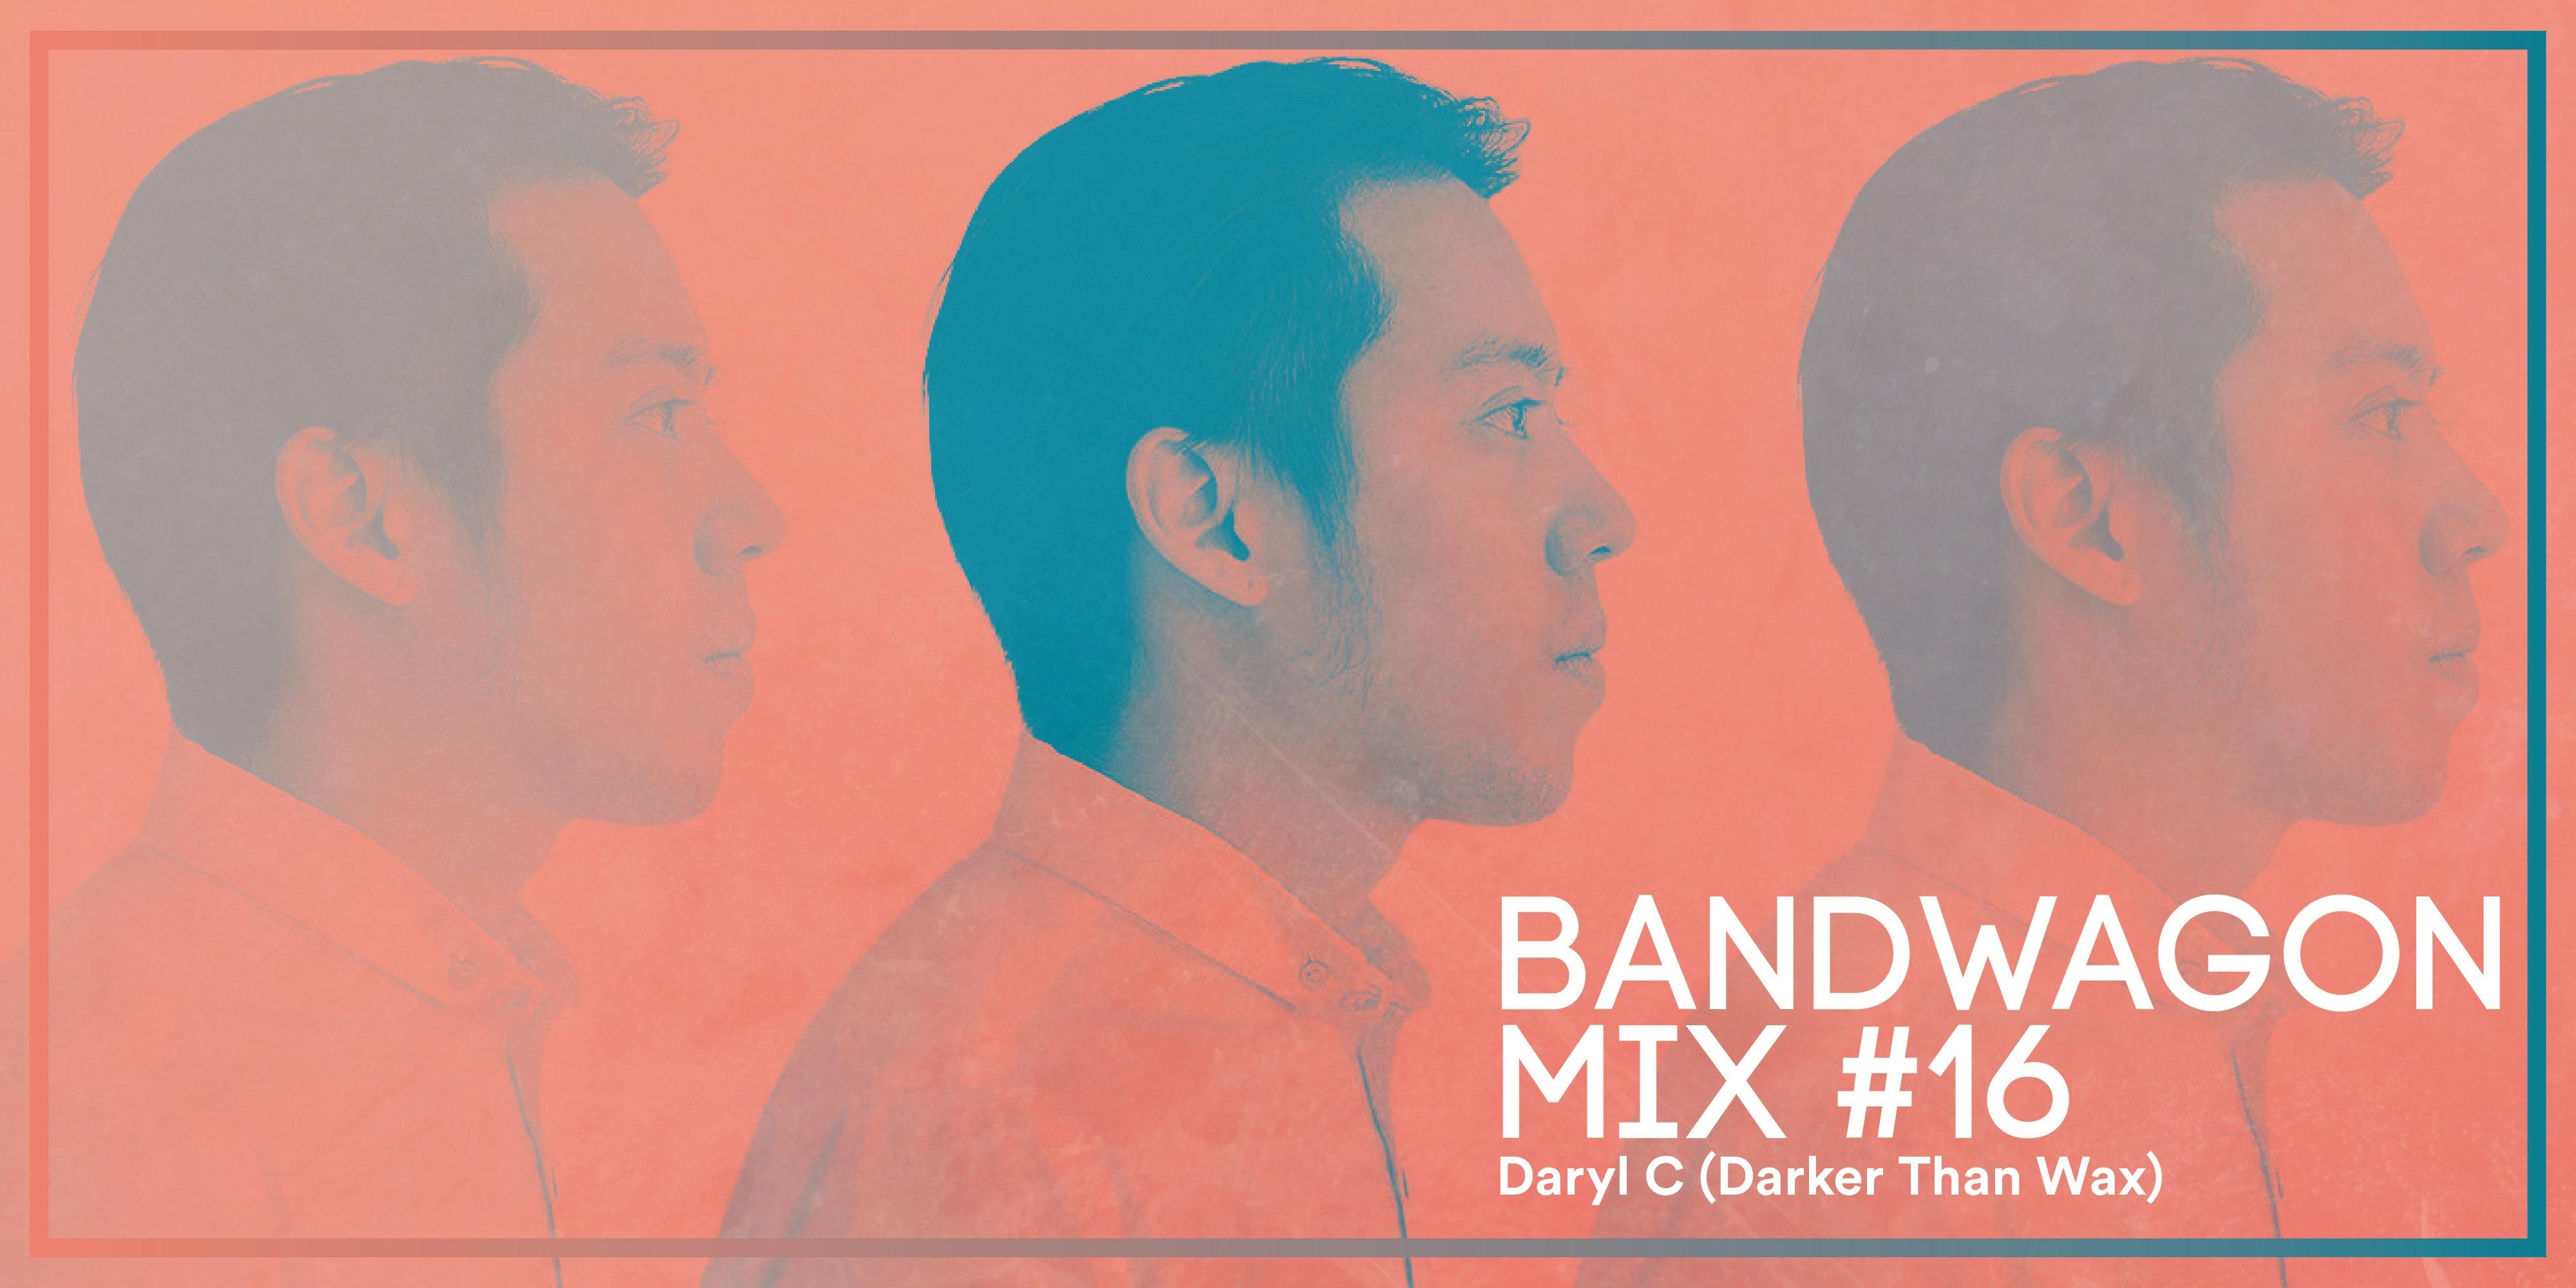 Bandwagon Mix #16: Daryl C (Darker Than Wax)